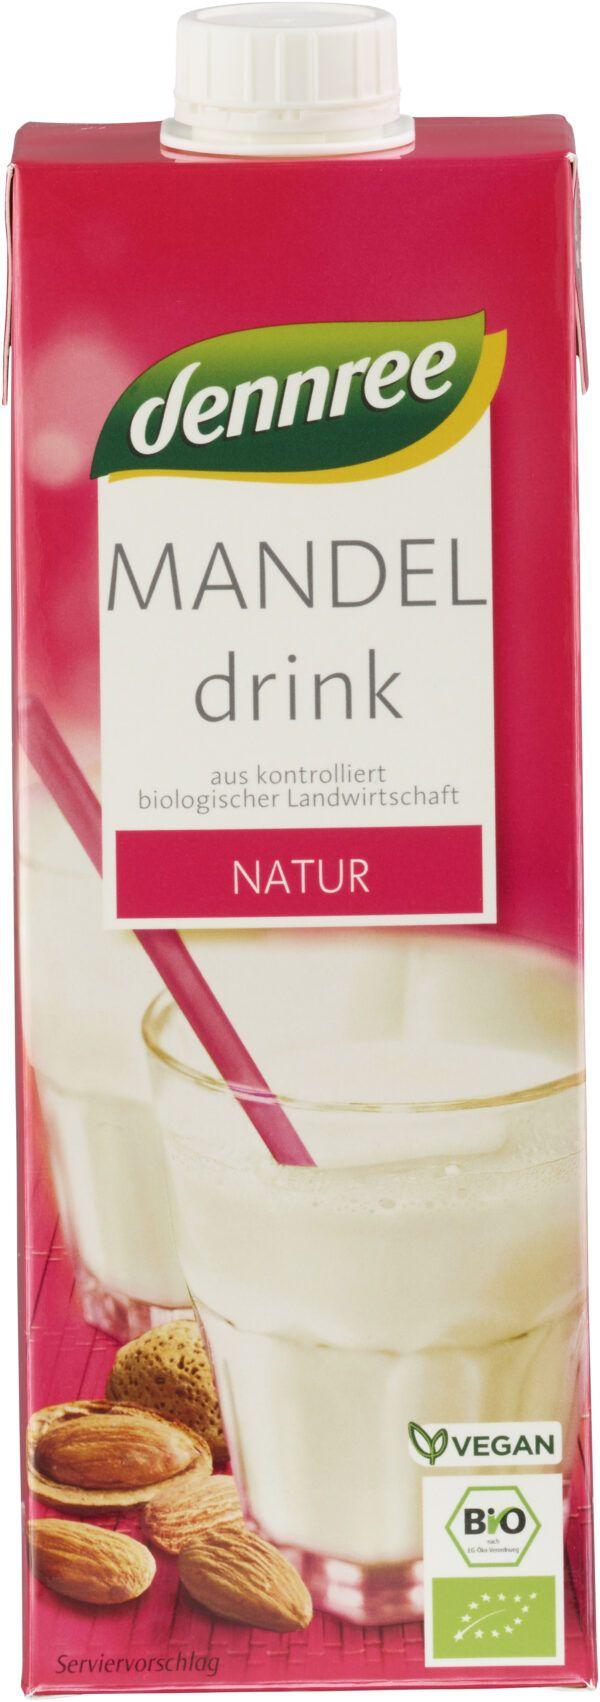 dennree Mandeldrink Natur 10x1l